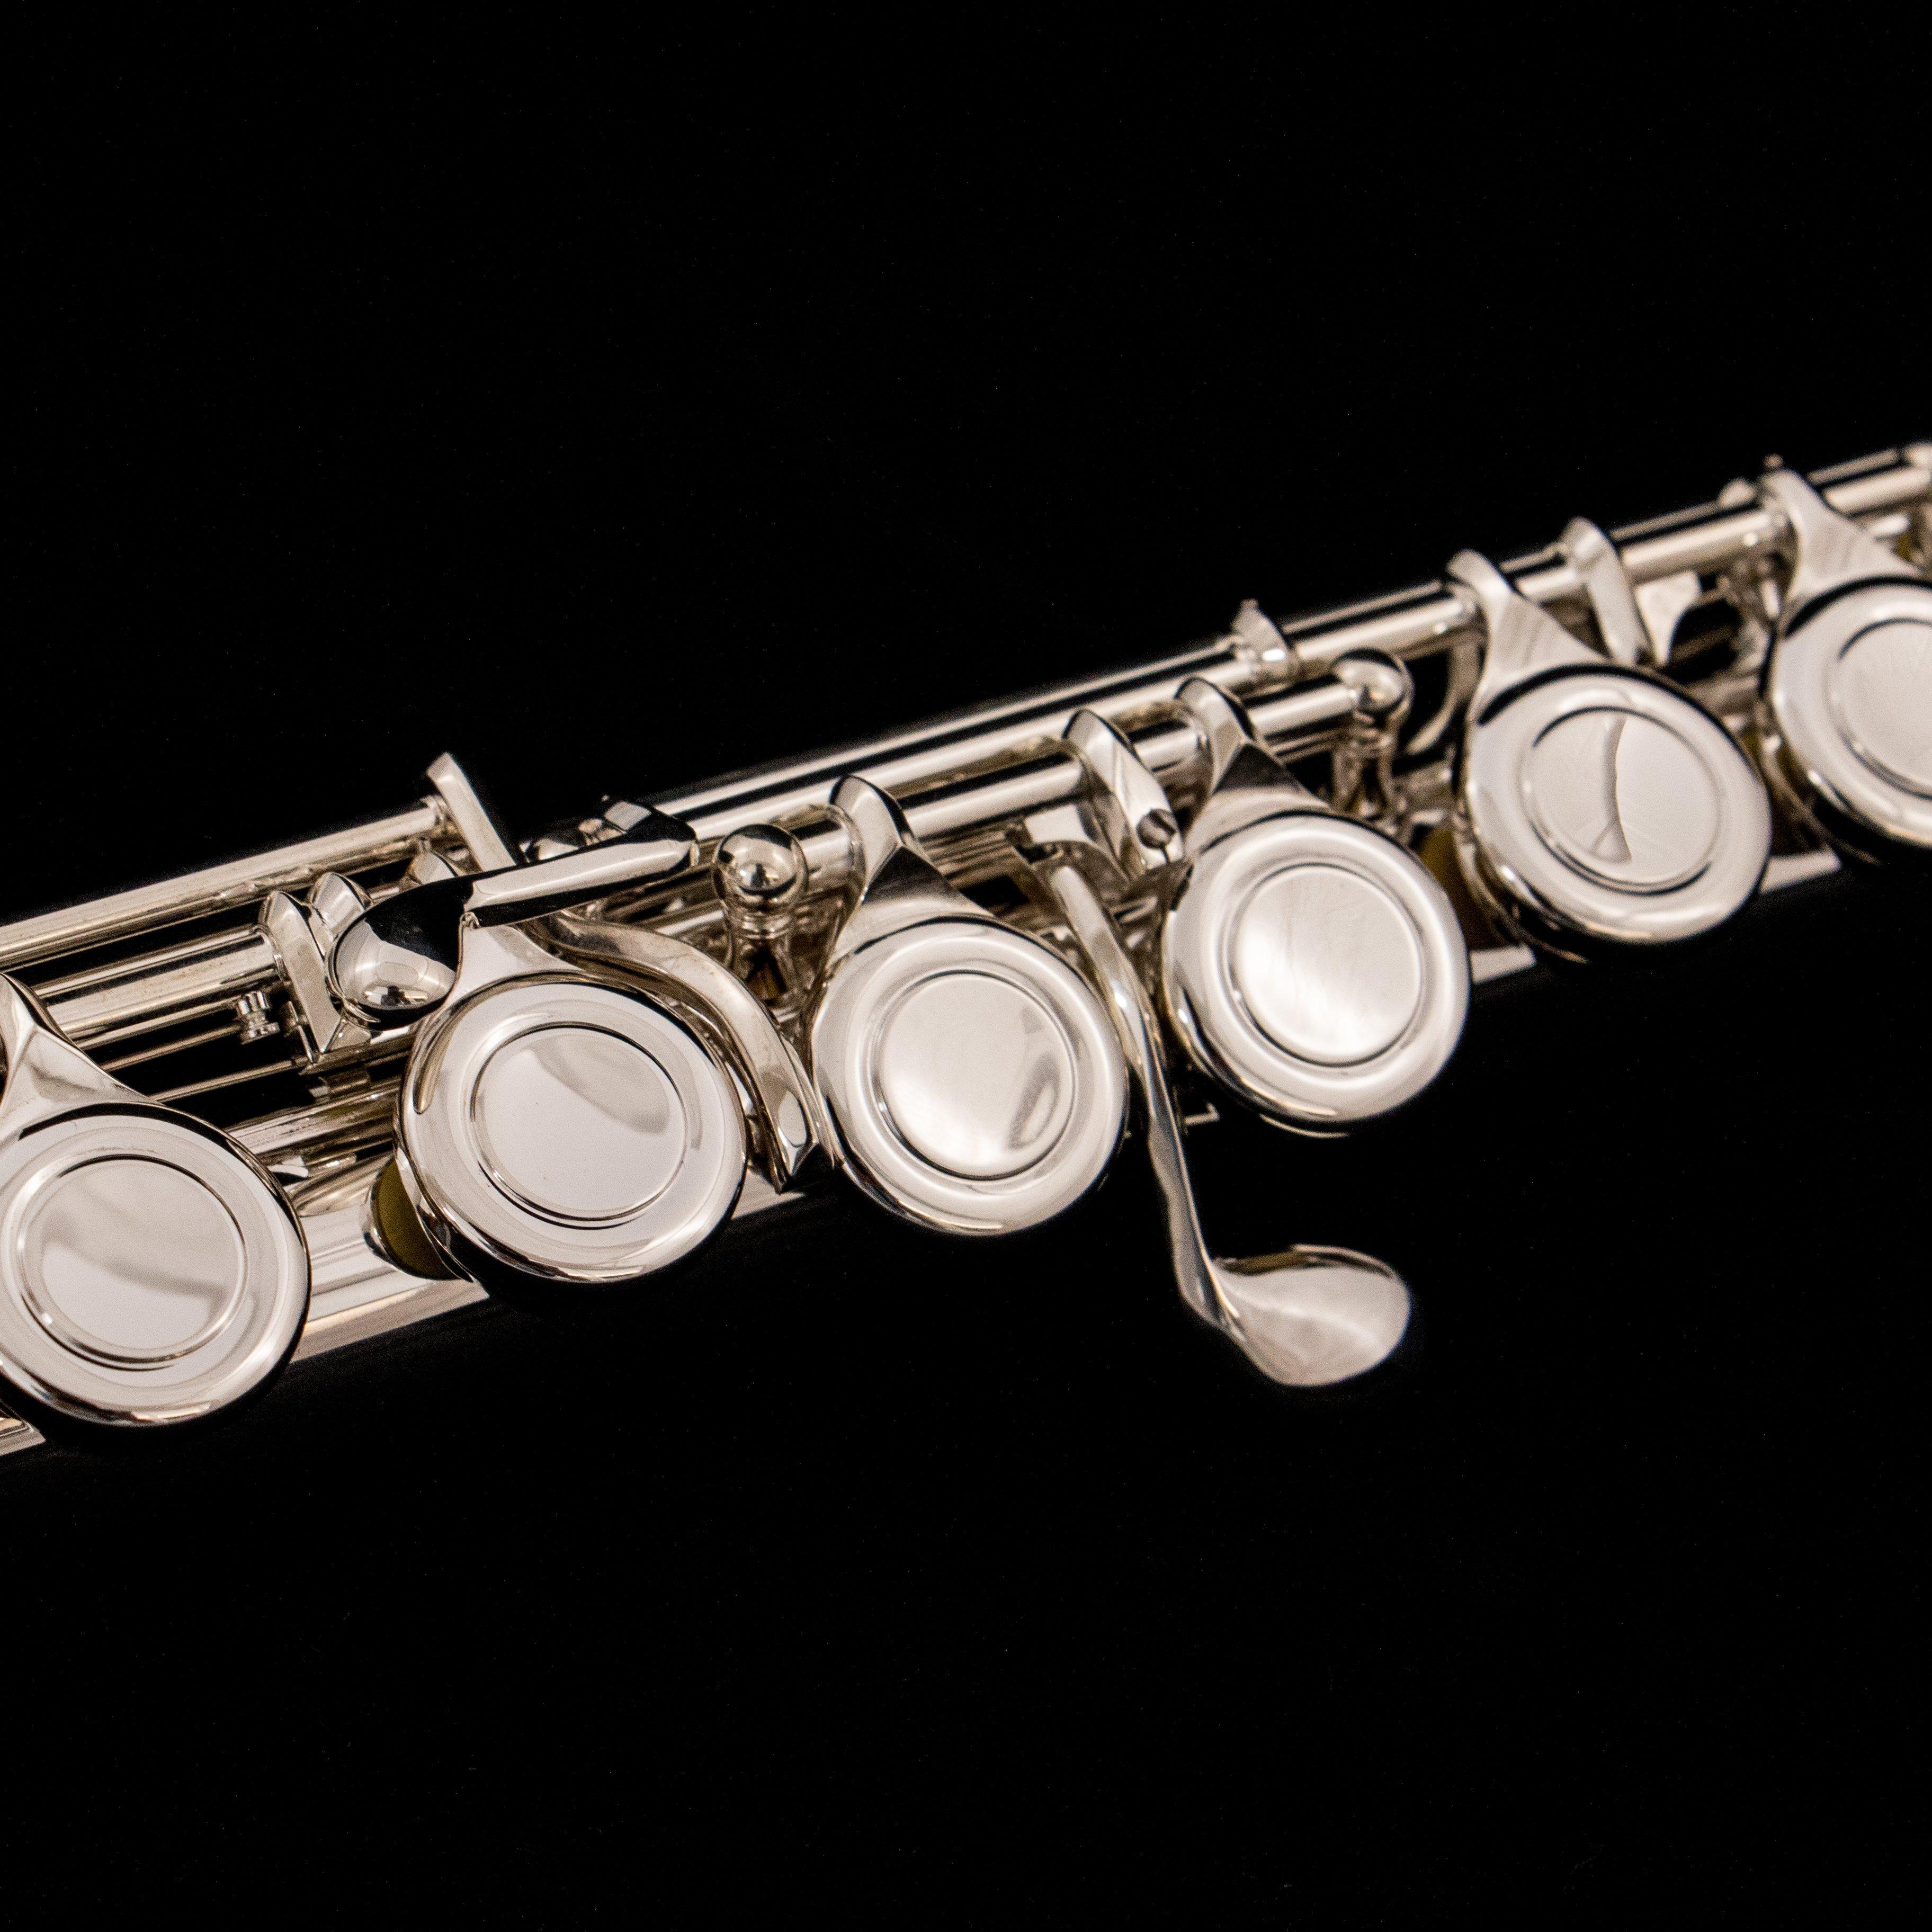 R710SE - Chiavi flauto traverso